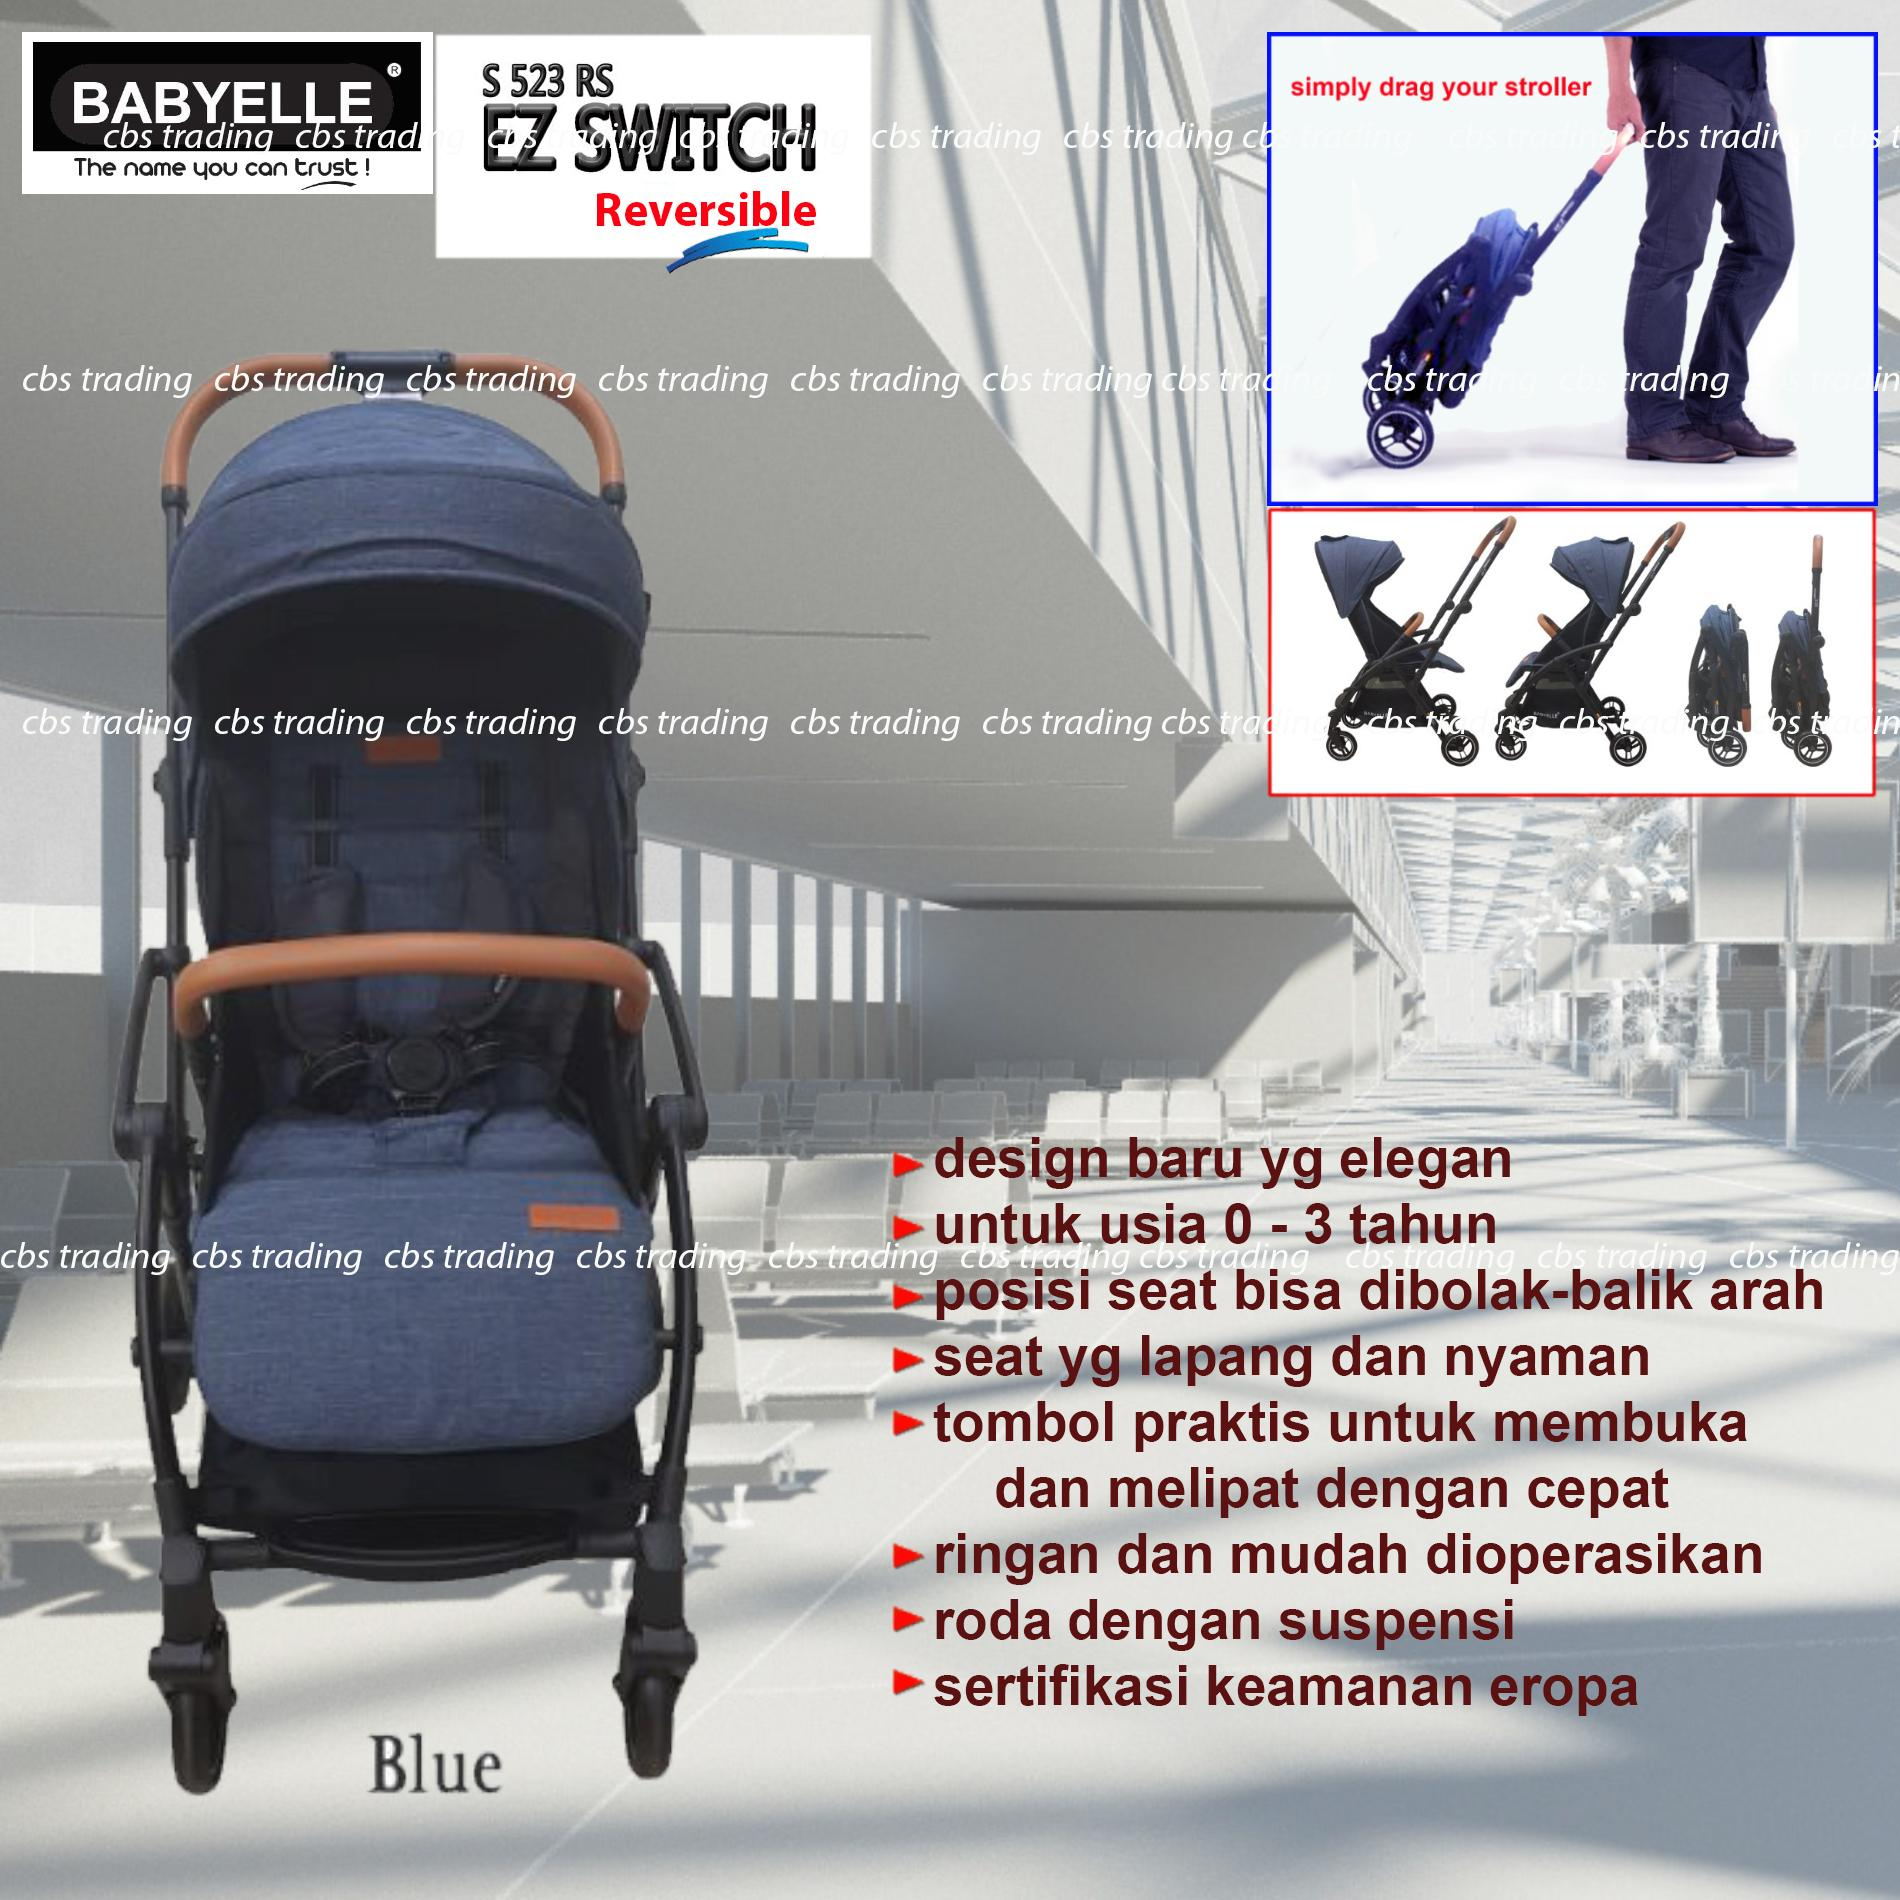 Jual Produk Baby Elle Terlengkap Babyelle Automatic Swing Pink 32007 Stroller S523rs Ez Switch Lightweight Travelmate Kereta Dorong Bayi Blue